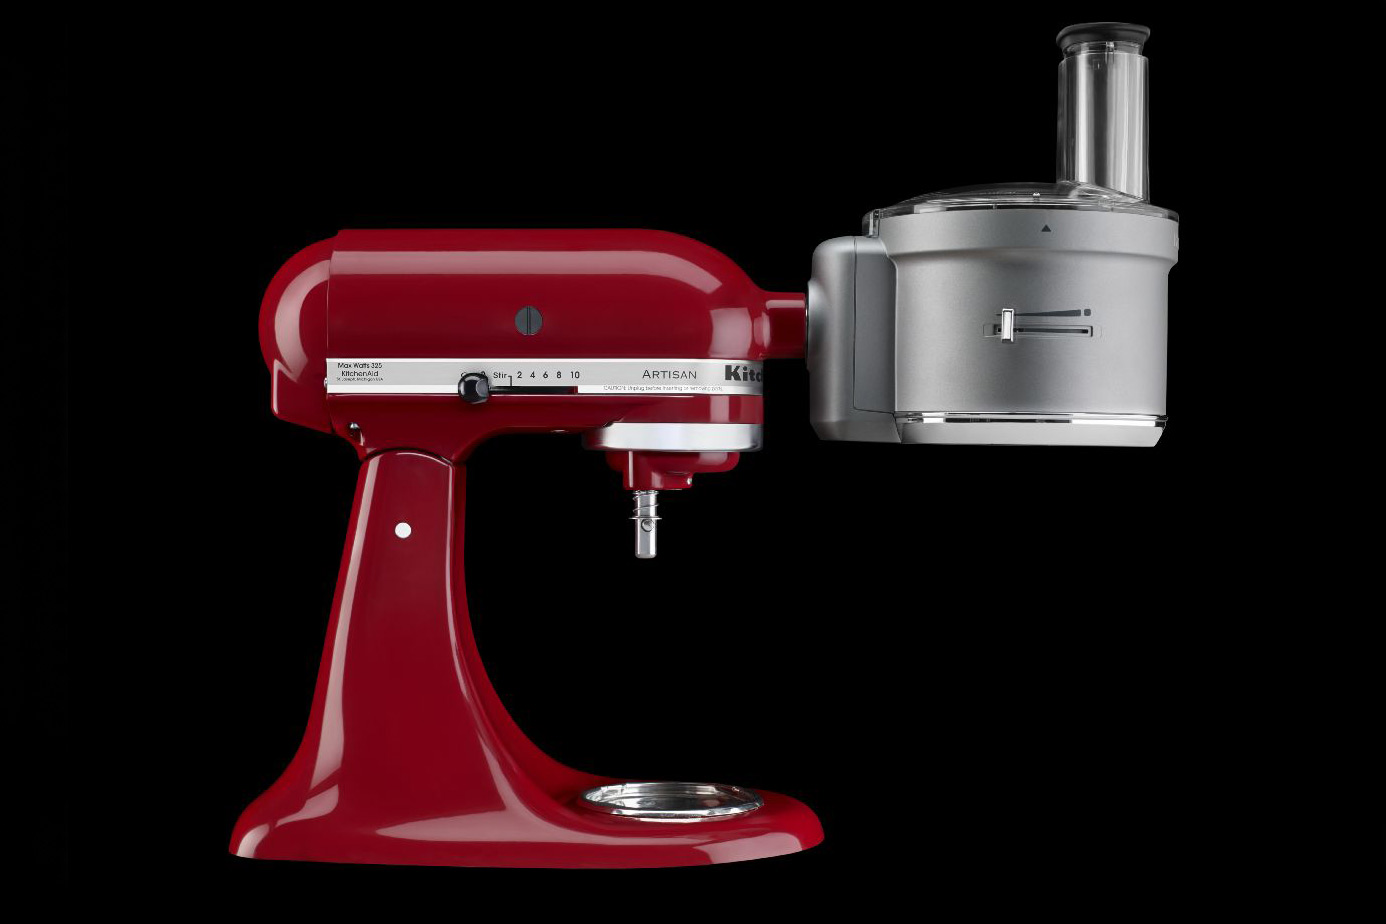 Can Use Kitchenaid Stand Mixer Food Processor